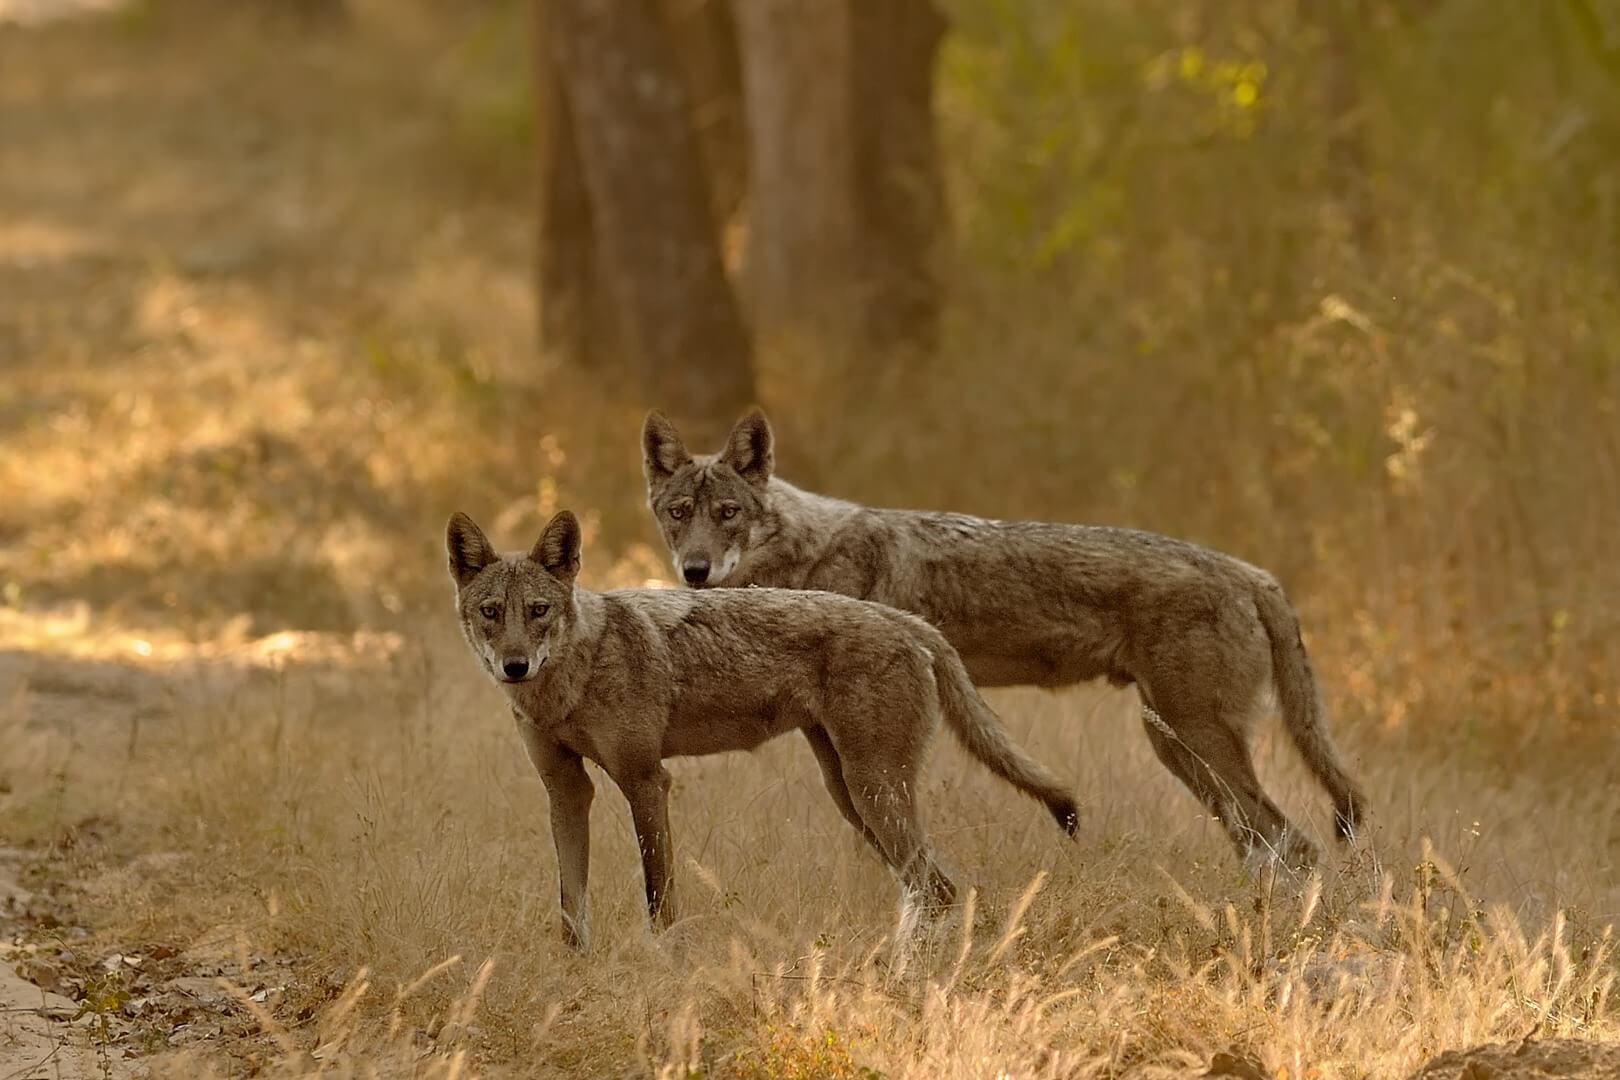 Wildlife safari in Karnataka at the Nagarhole National Park